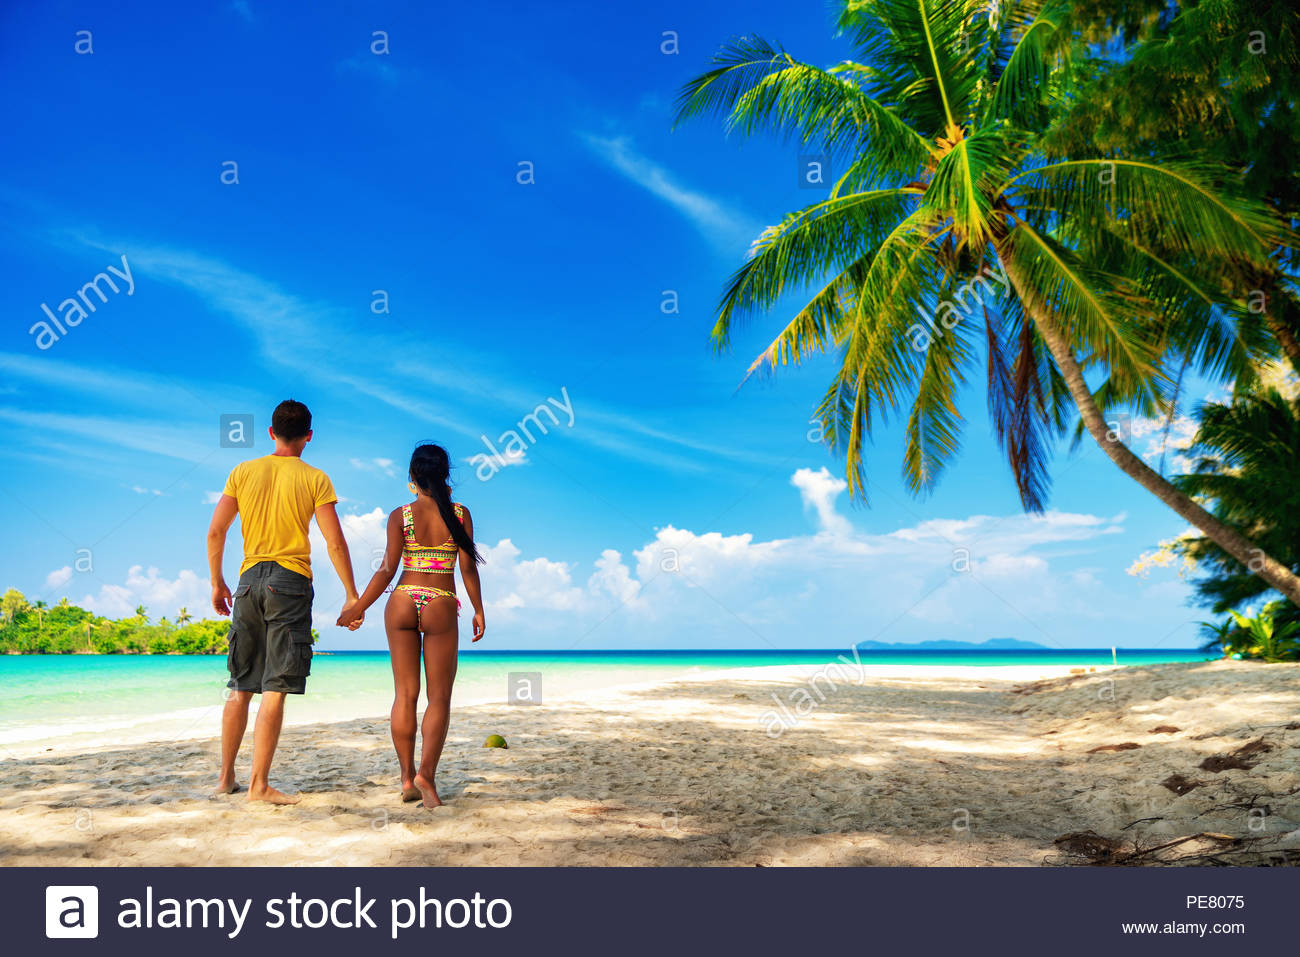 Loving couple tourist enjoy honeymoon vacation on the tropical 1300x957